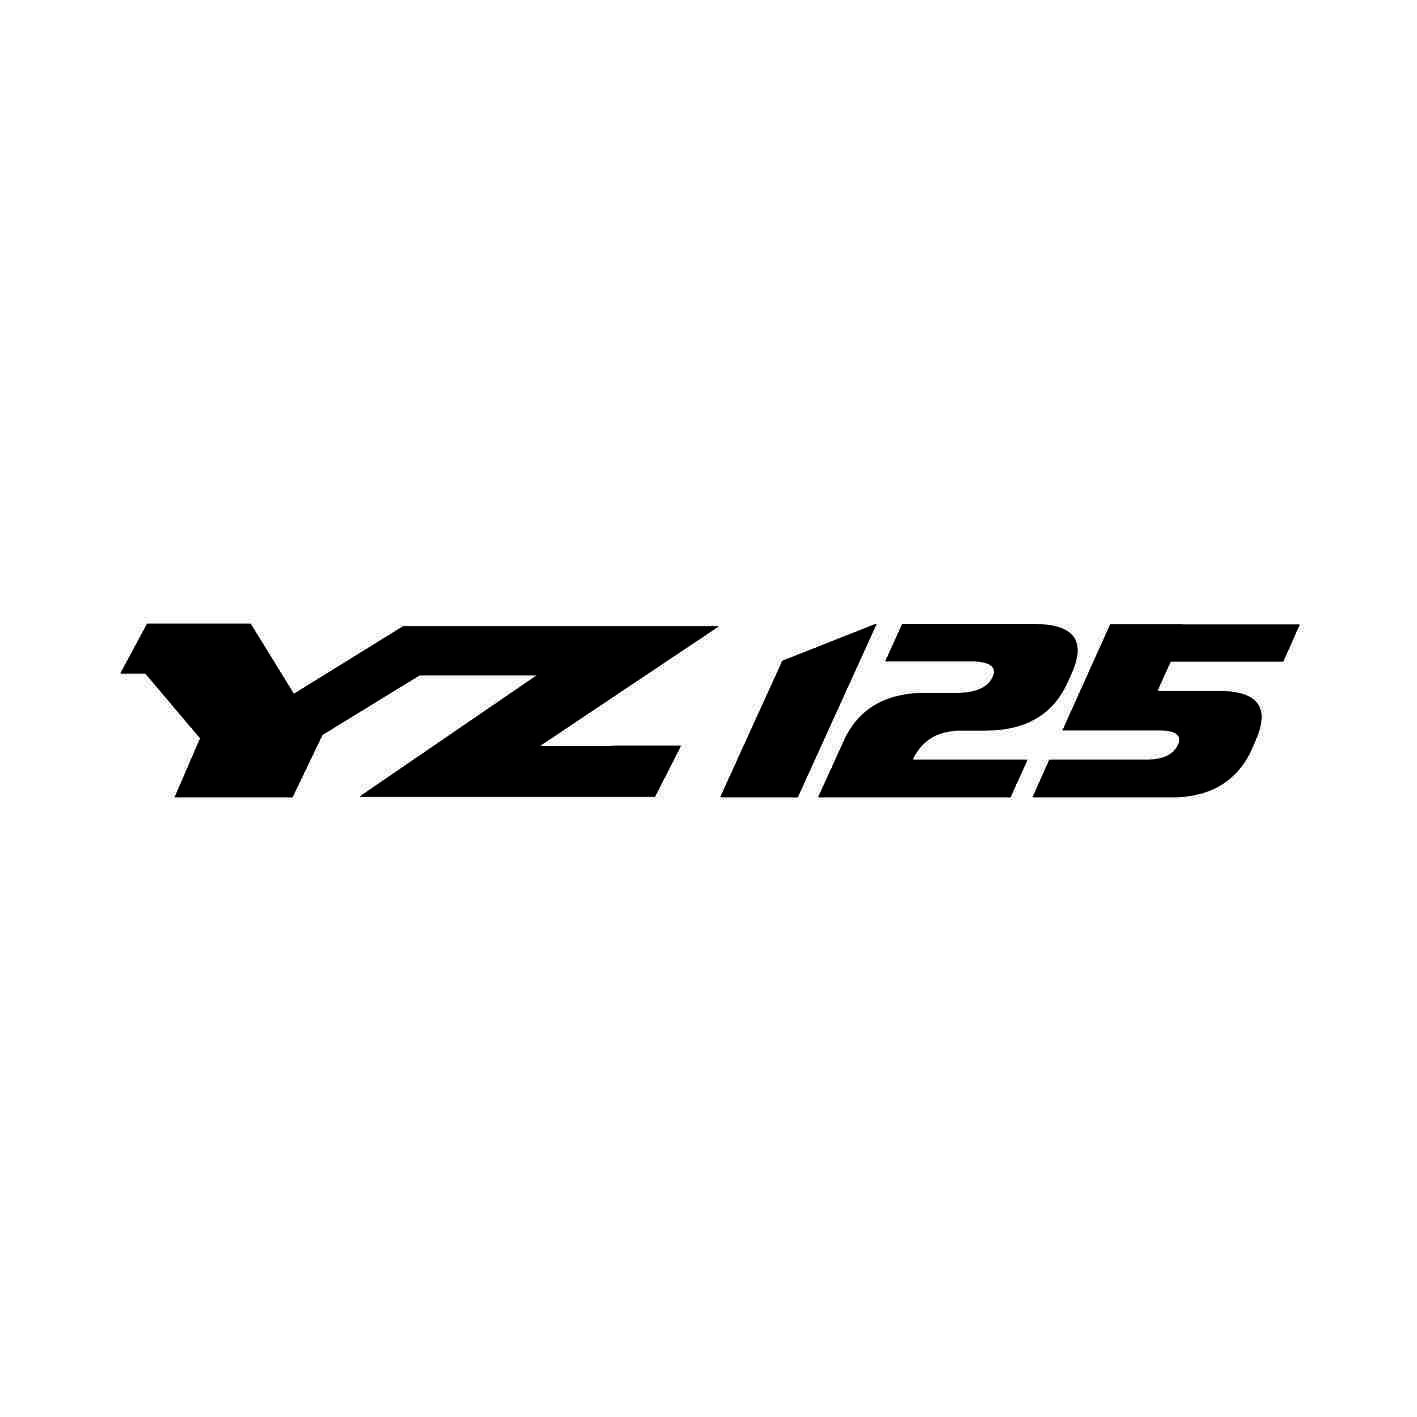 yamaha-ref60-yz-125-stickers-moto-casque-scooter-sticker-autocollant-adhesifs